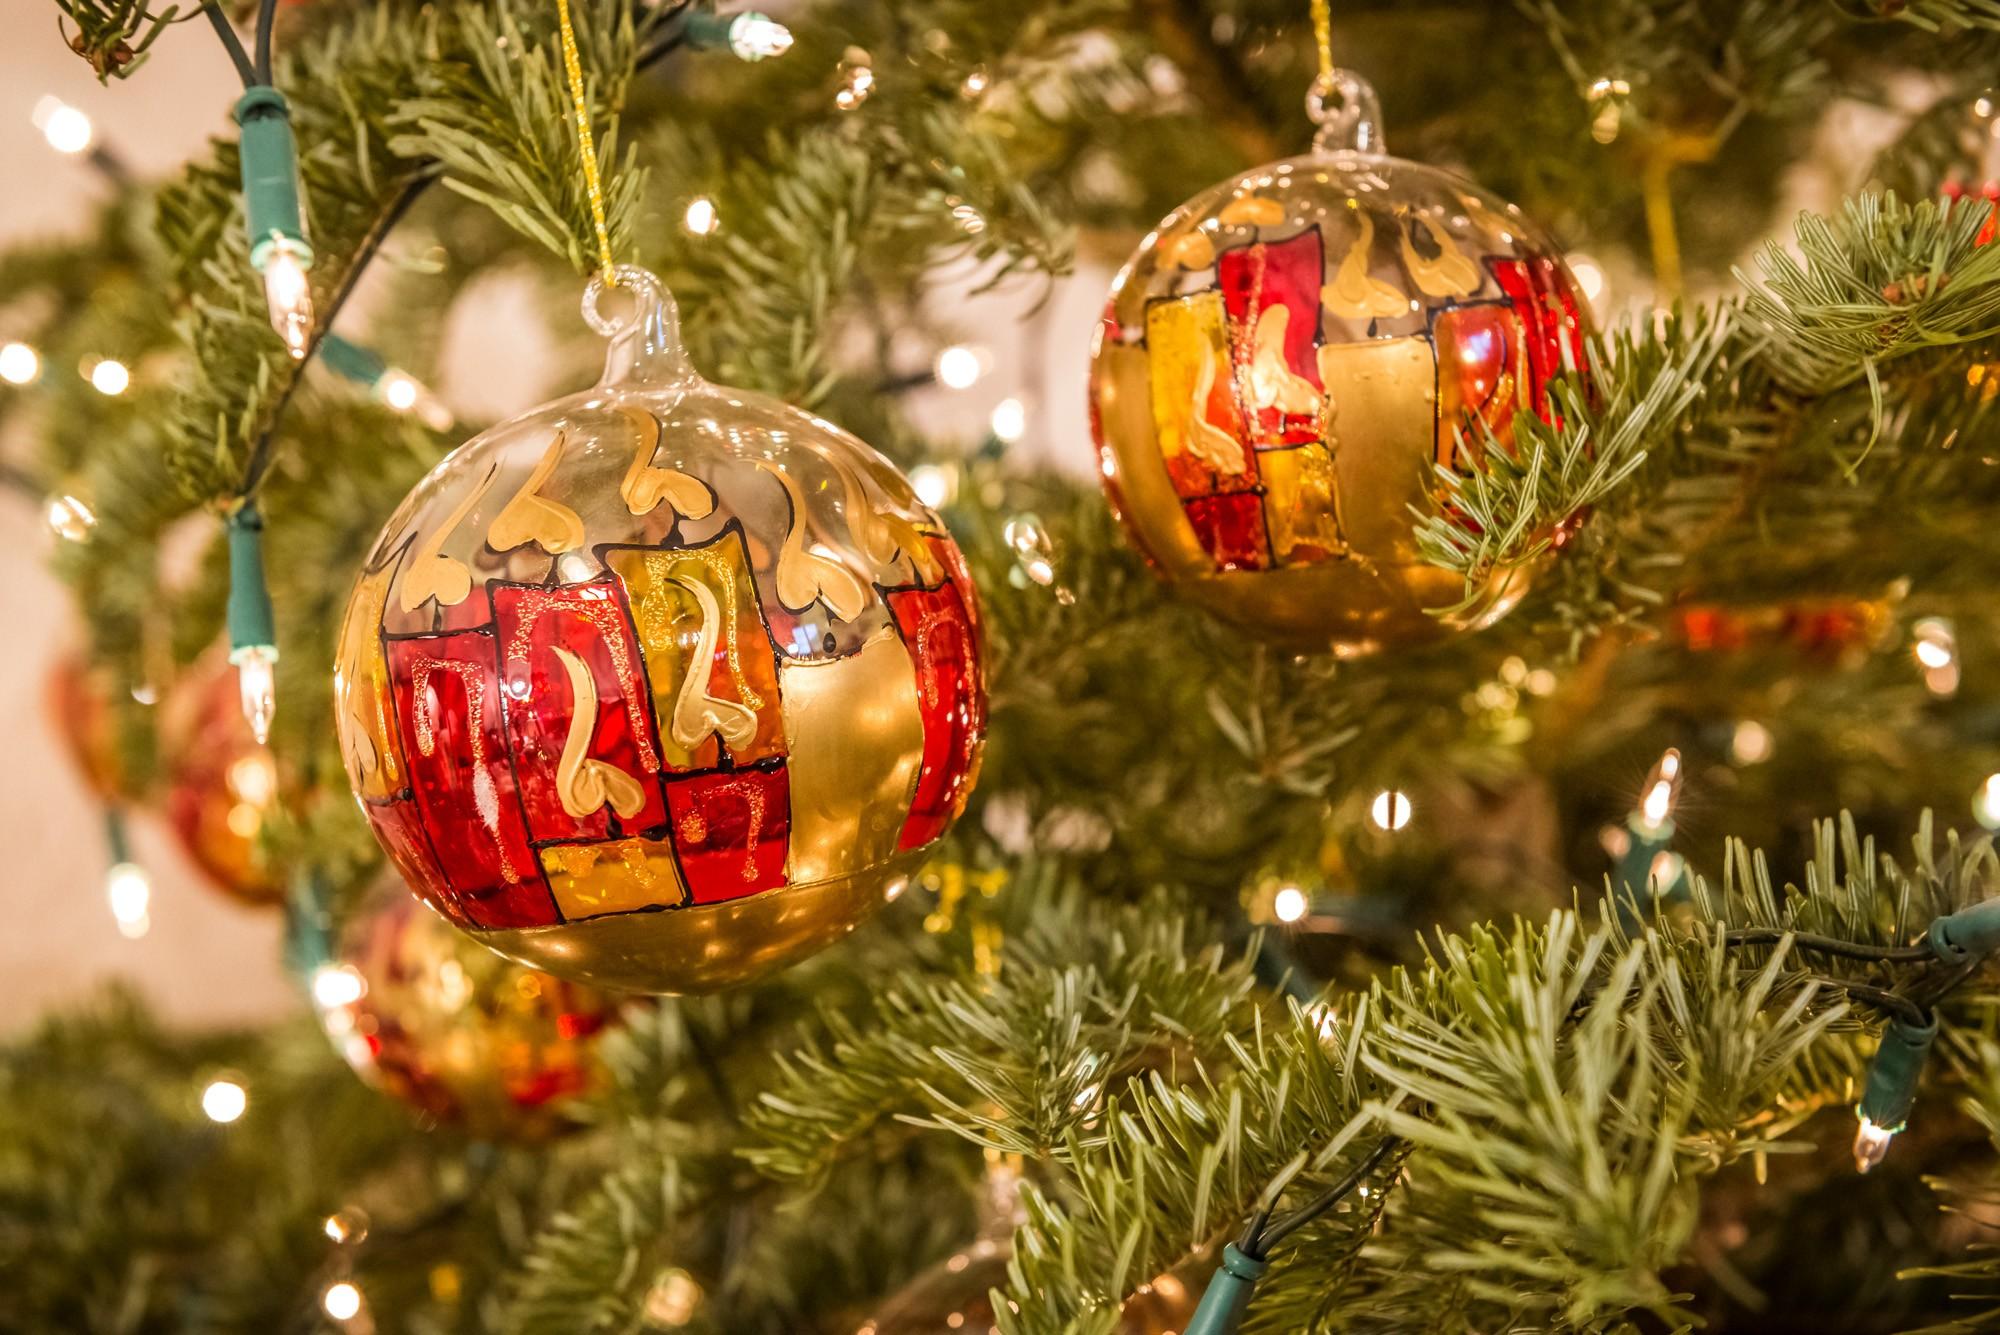 © SalzburgerLand Tourismus, Christmas